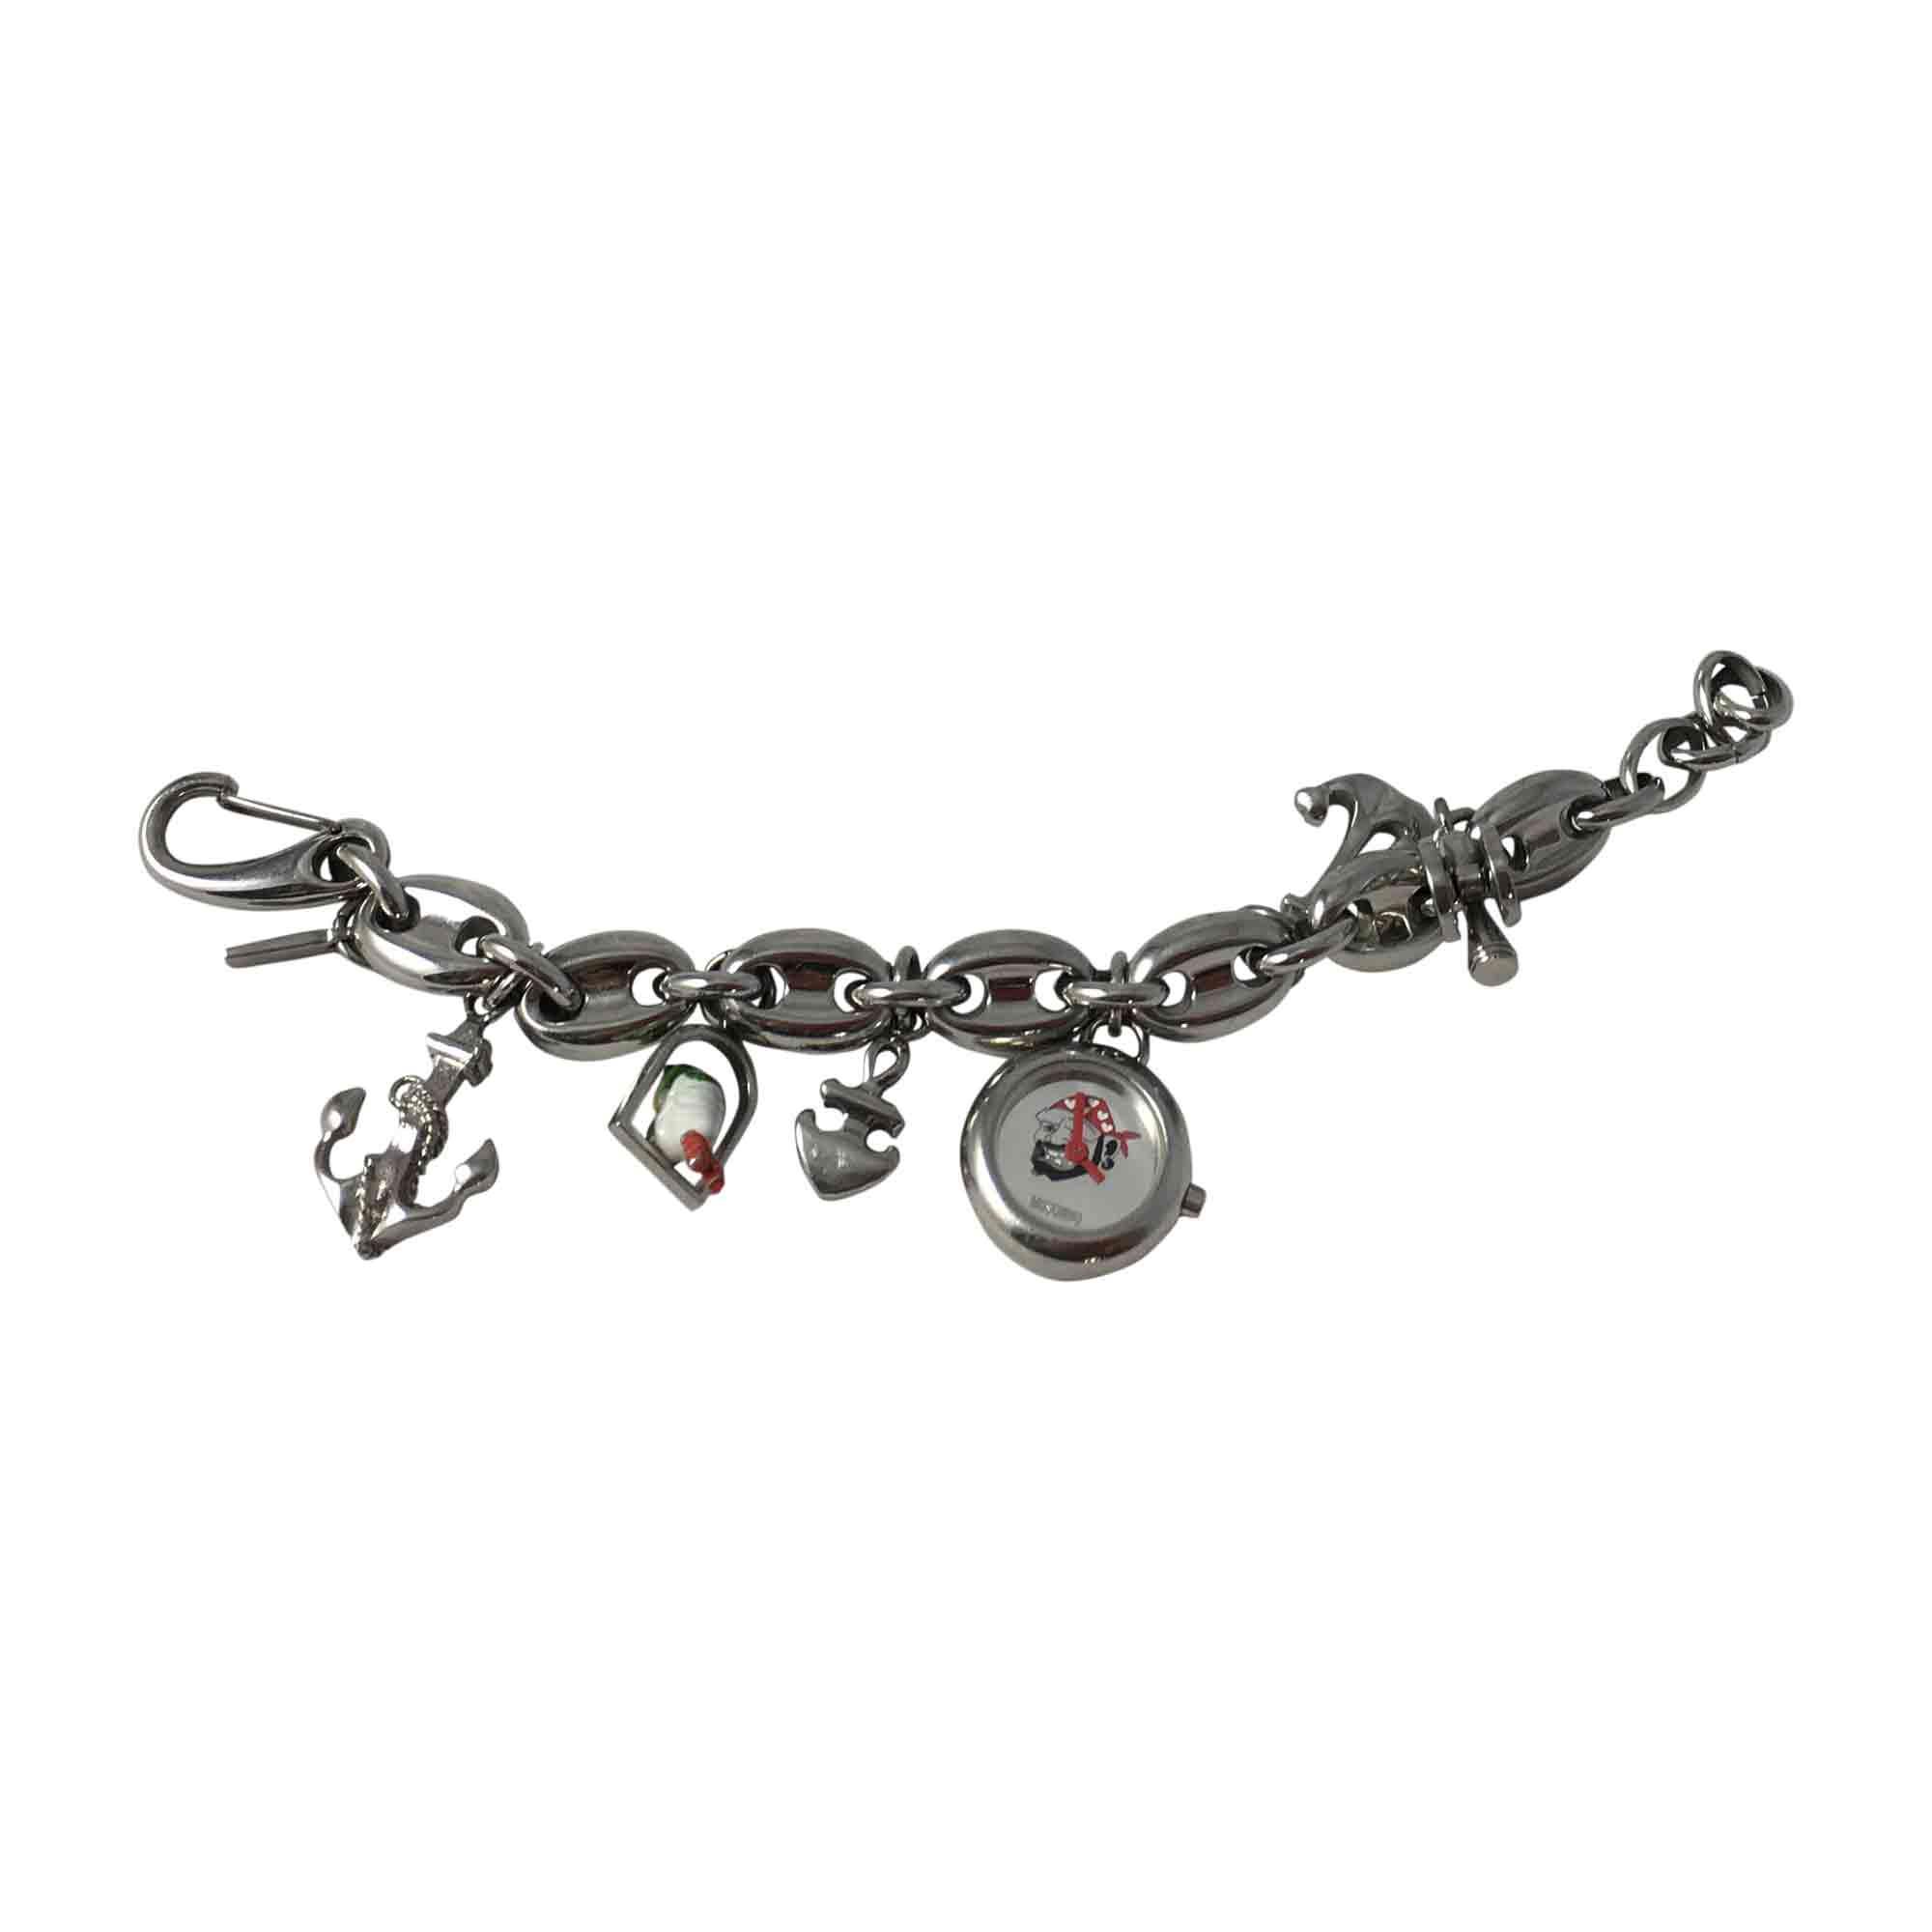 Moschino Jewelry | eBay